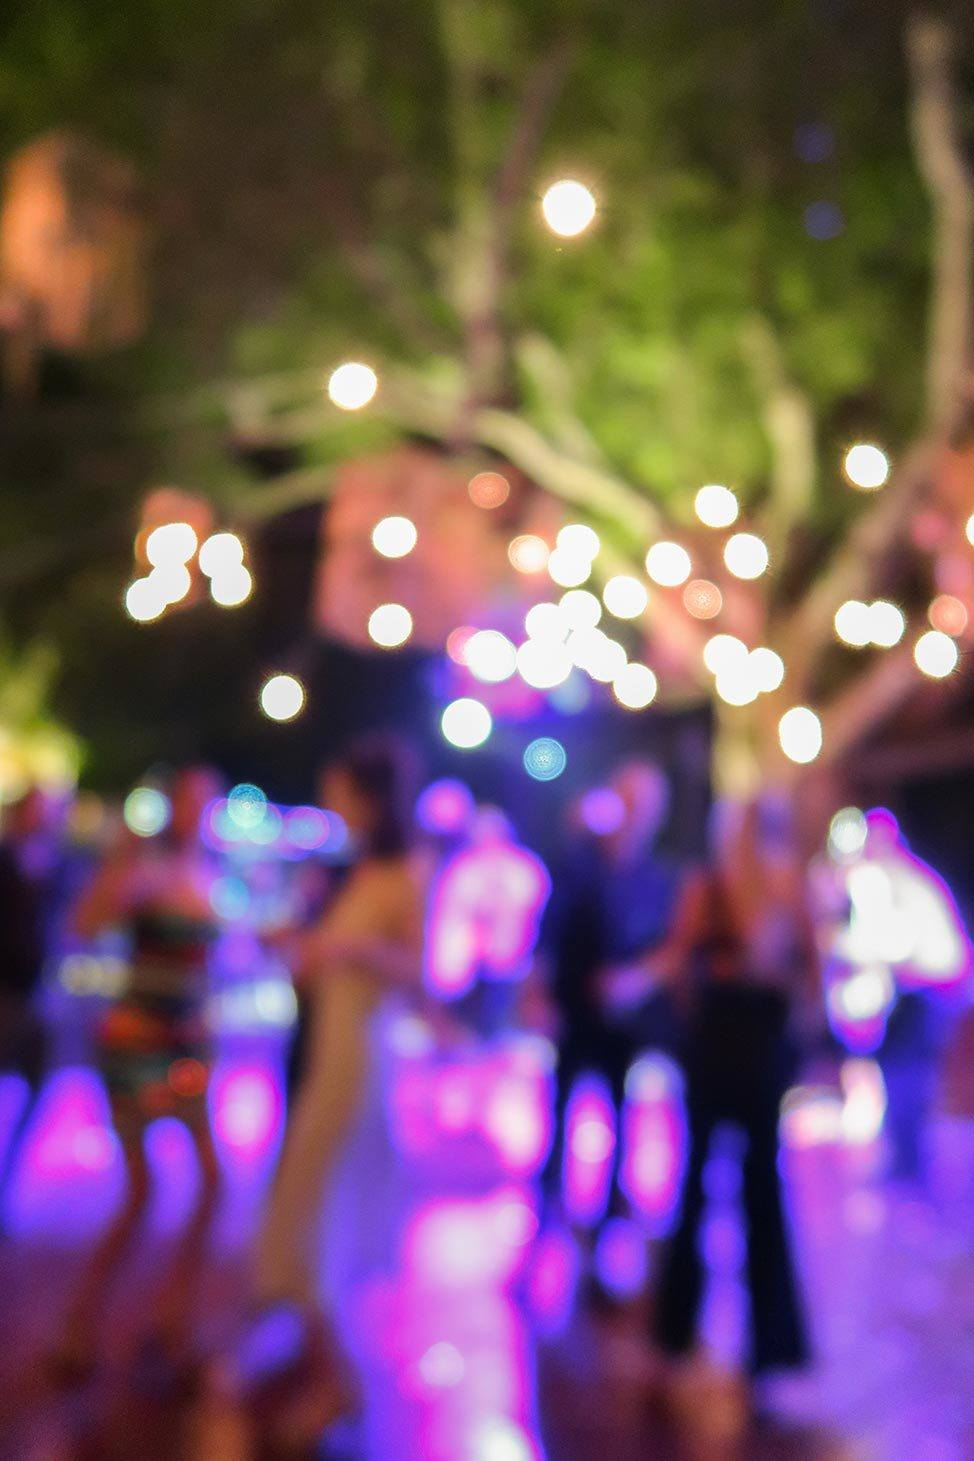 New Year's Eve Wedding at Hacienda Itzincab Cámara